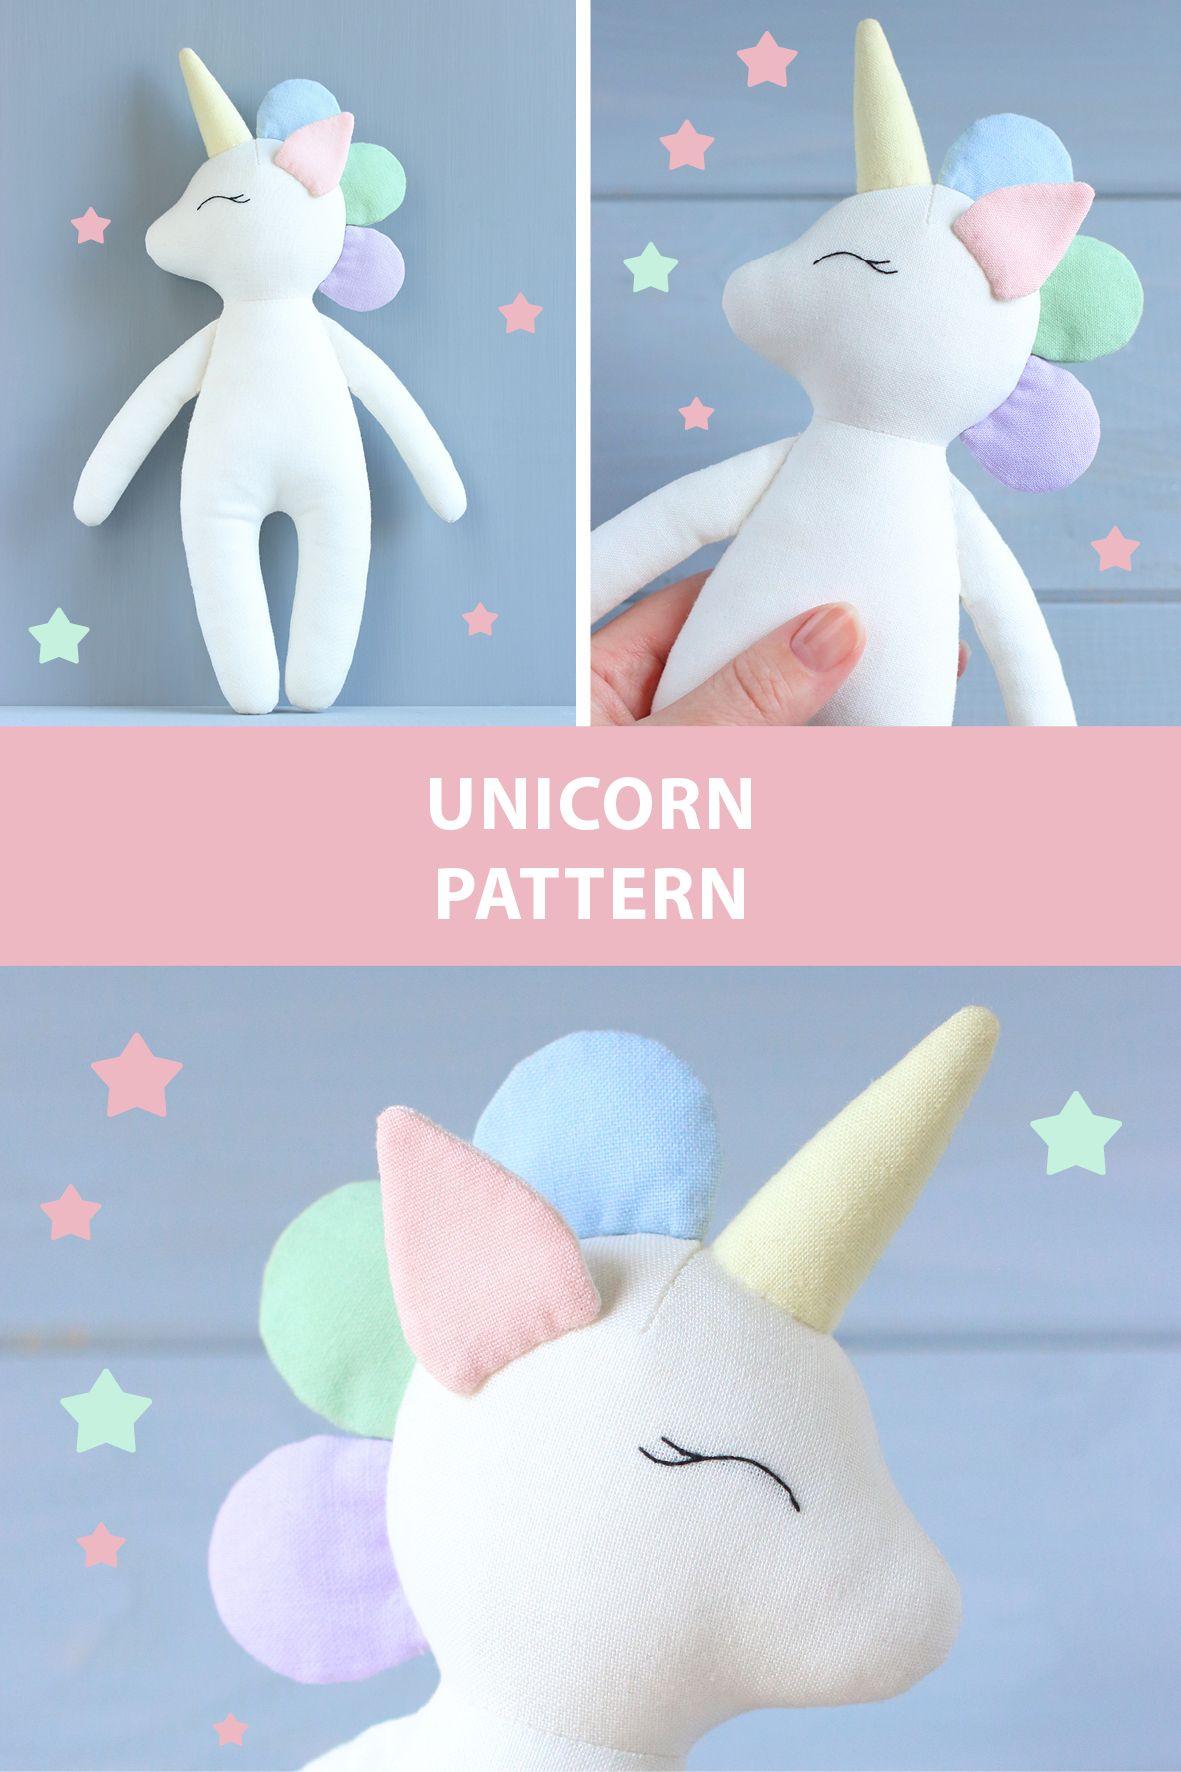 Unicorn Plush Pattern : unicorn, plush, pattern, Unicorn, Sewing, Pattern, Tutorial, Doll,, Stuffed, Animals